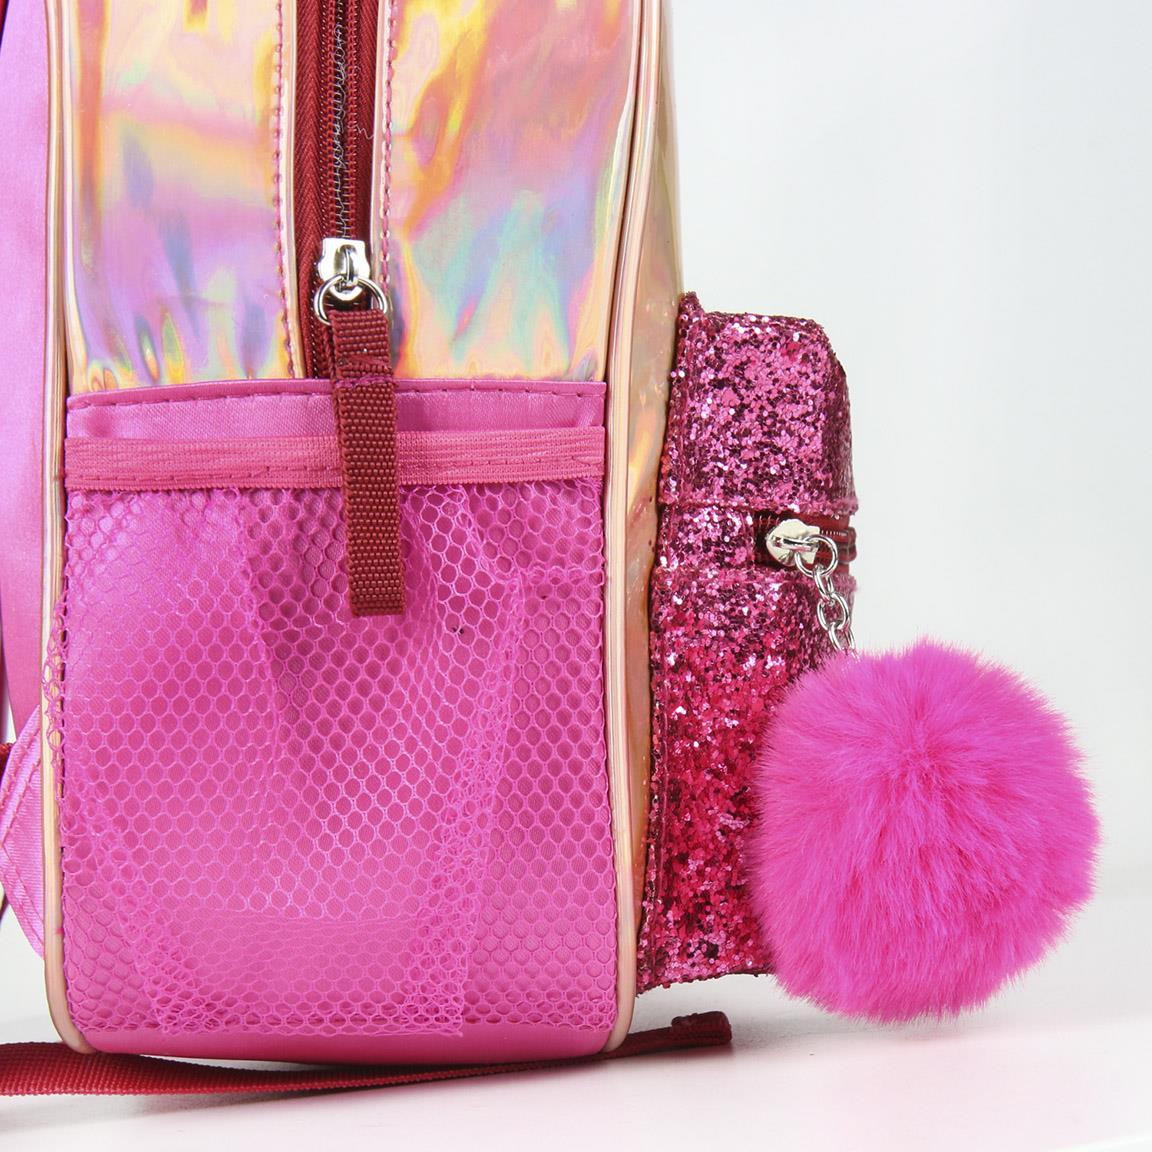 Minnie Fashion Backpack